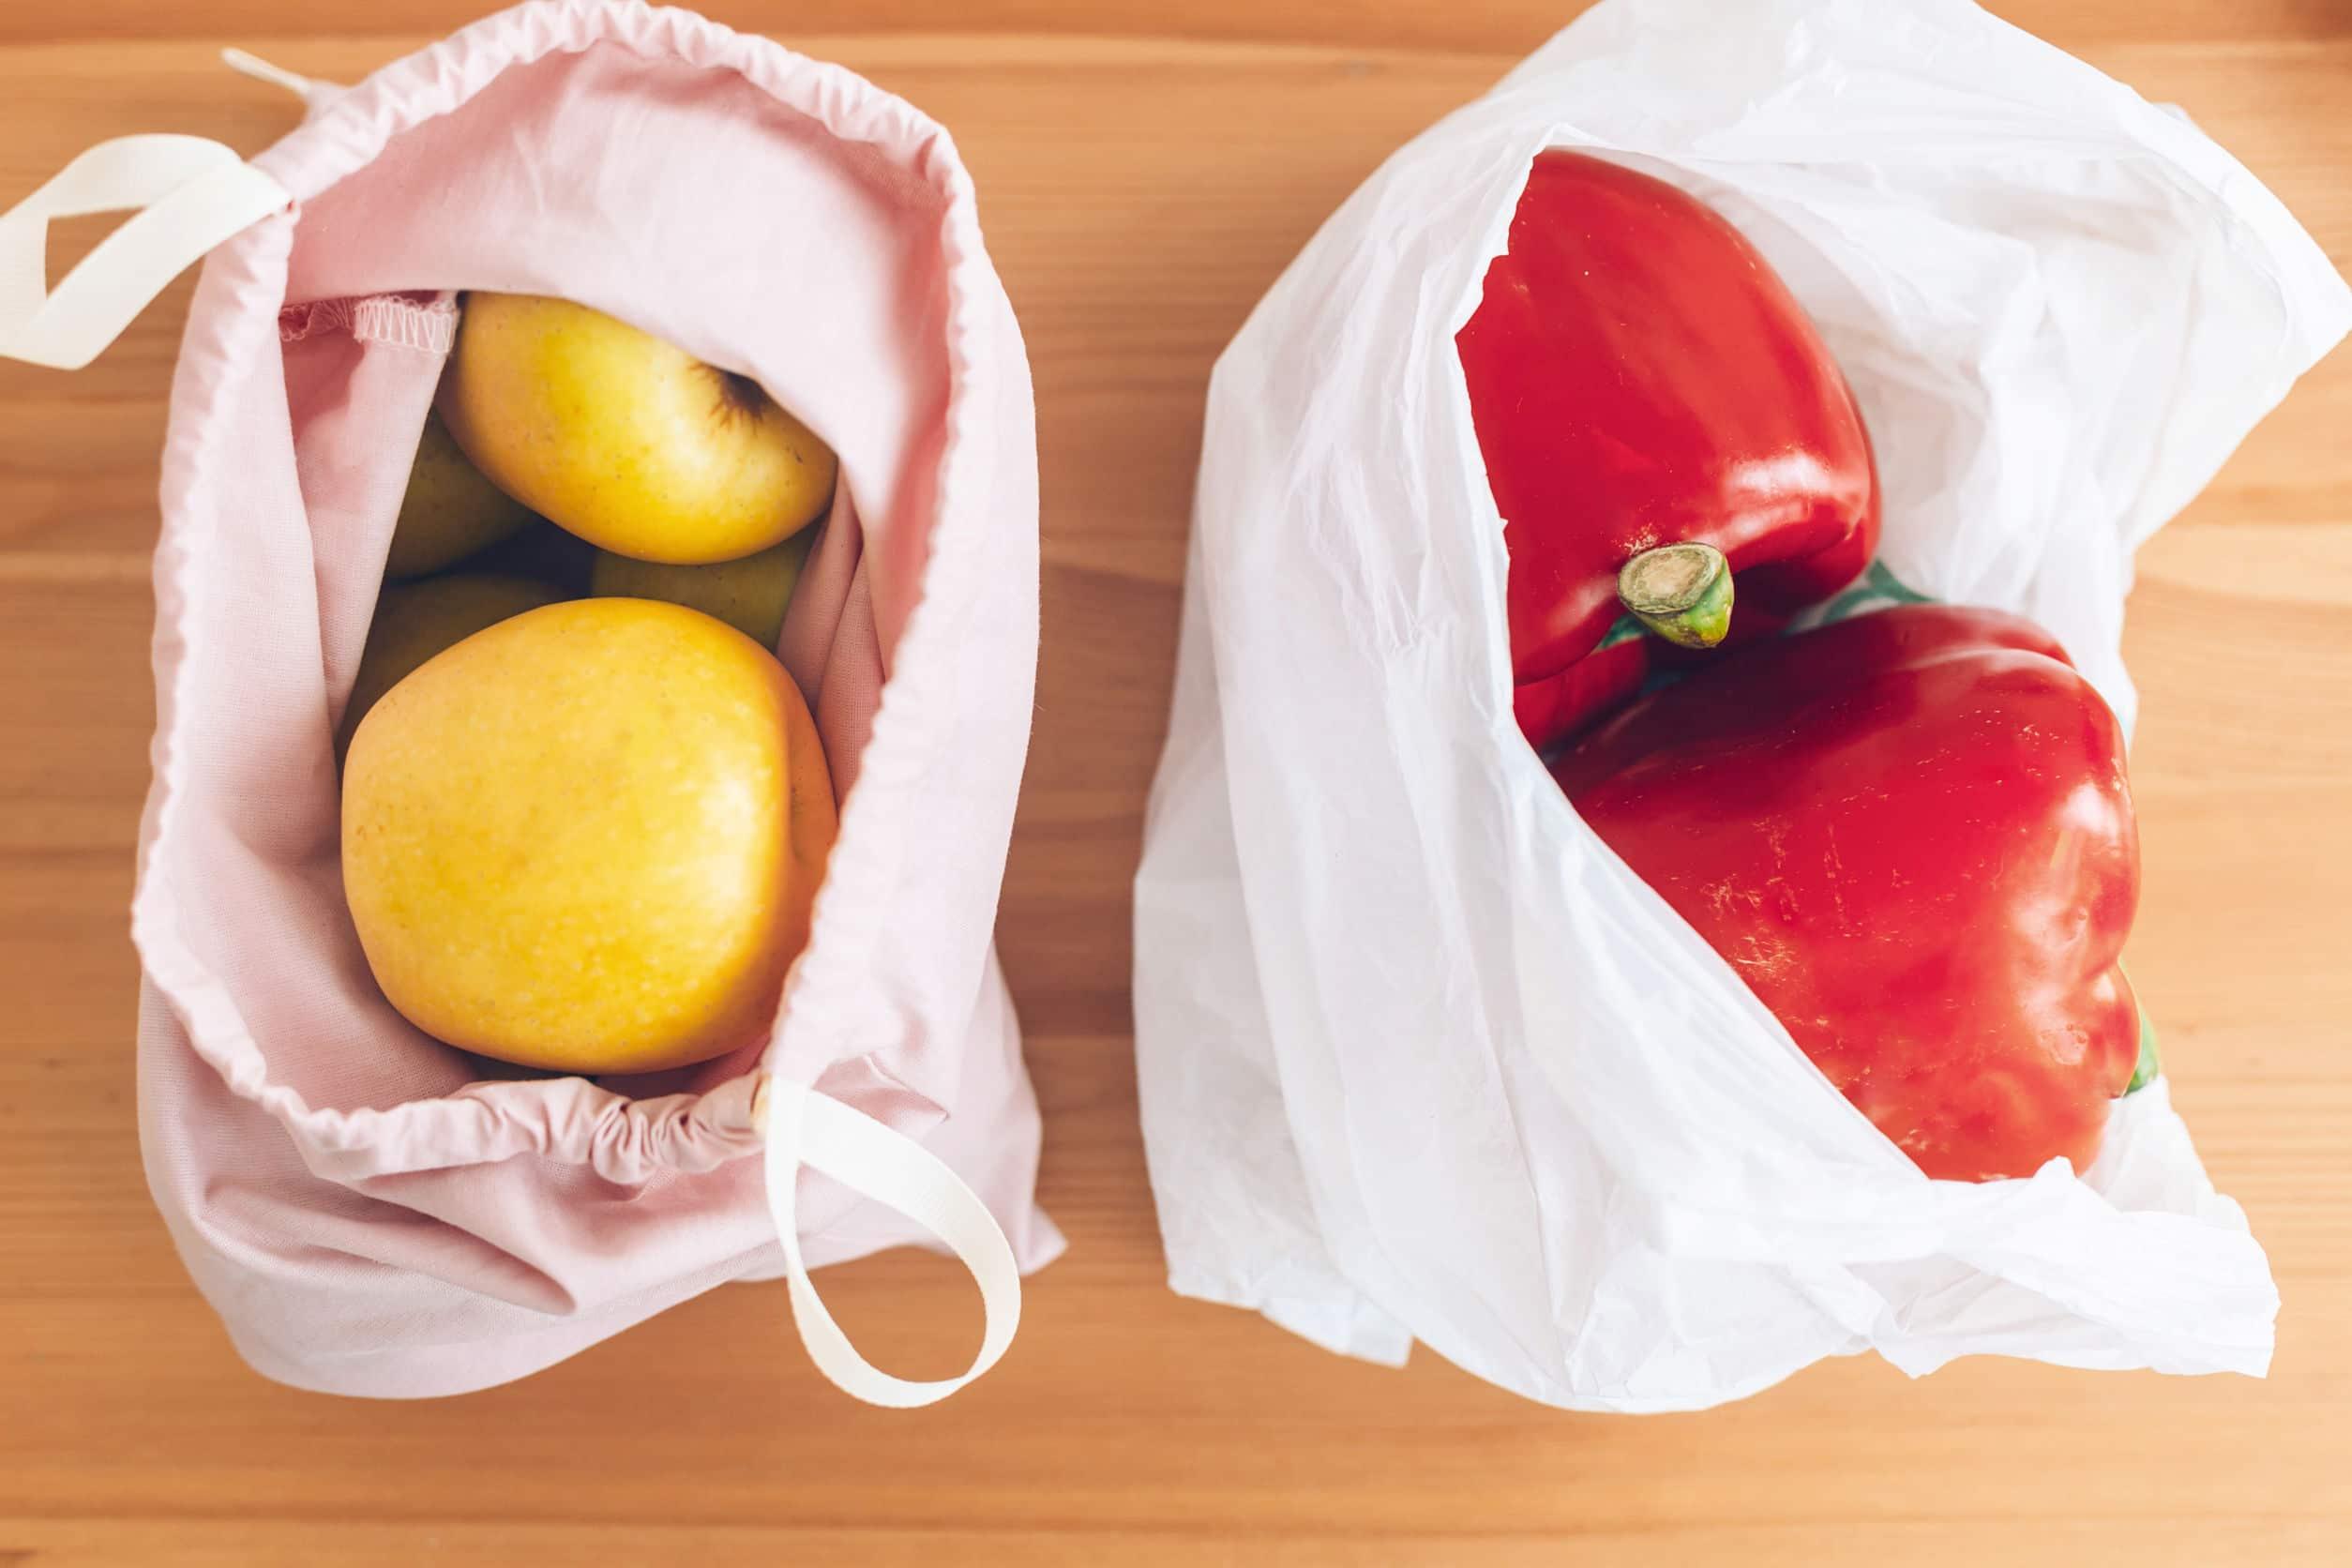 Sacola sustentável ao lado de sacola de plástico.